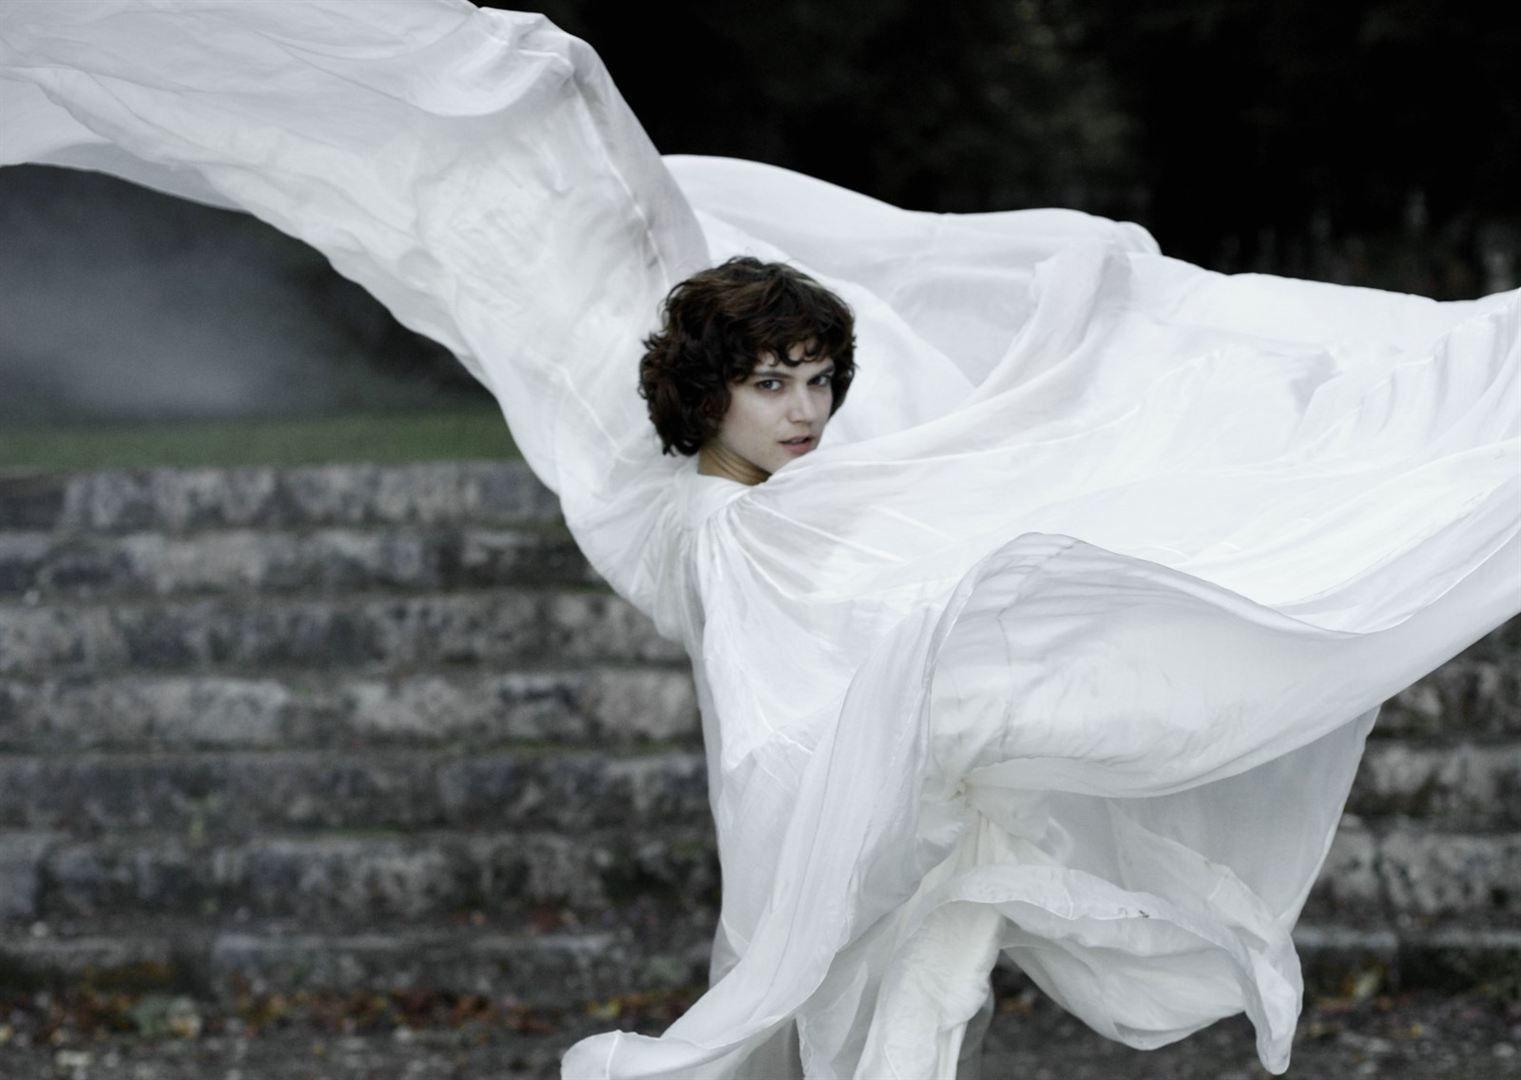 'La danseuse', de Stéphanie Di Giusto